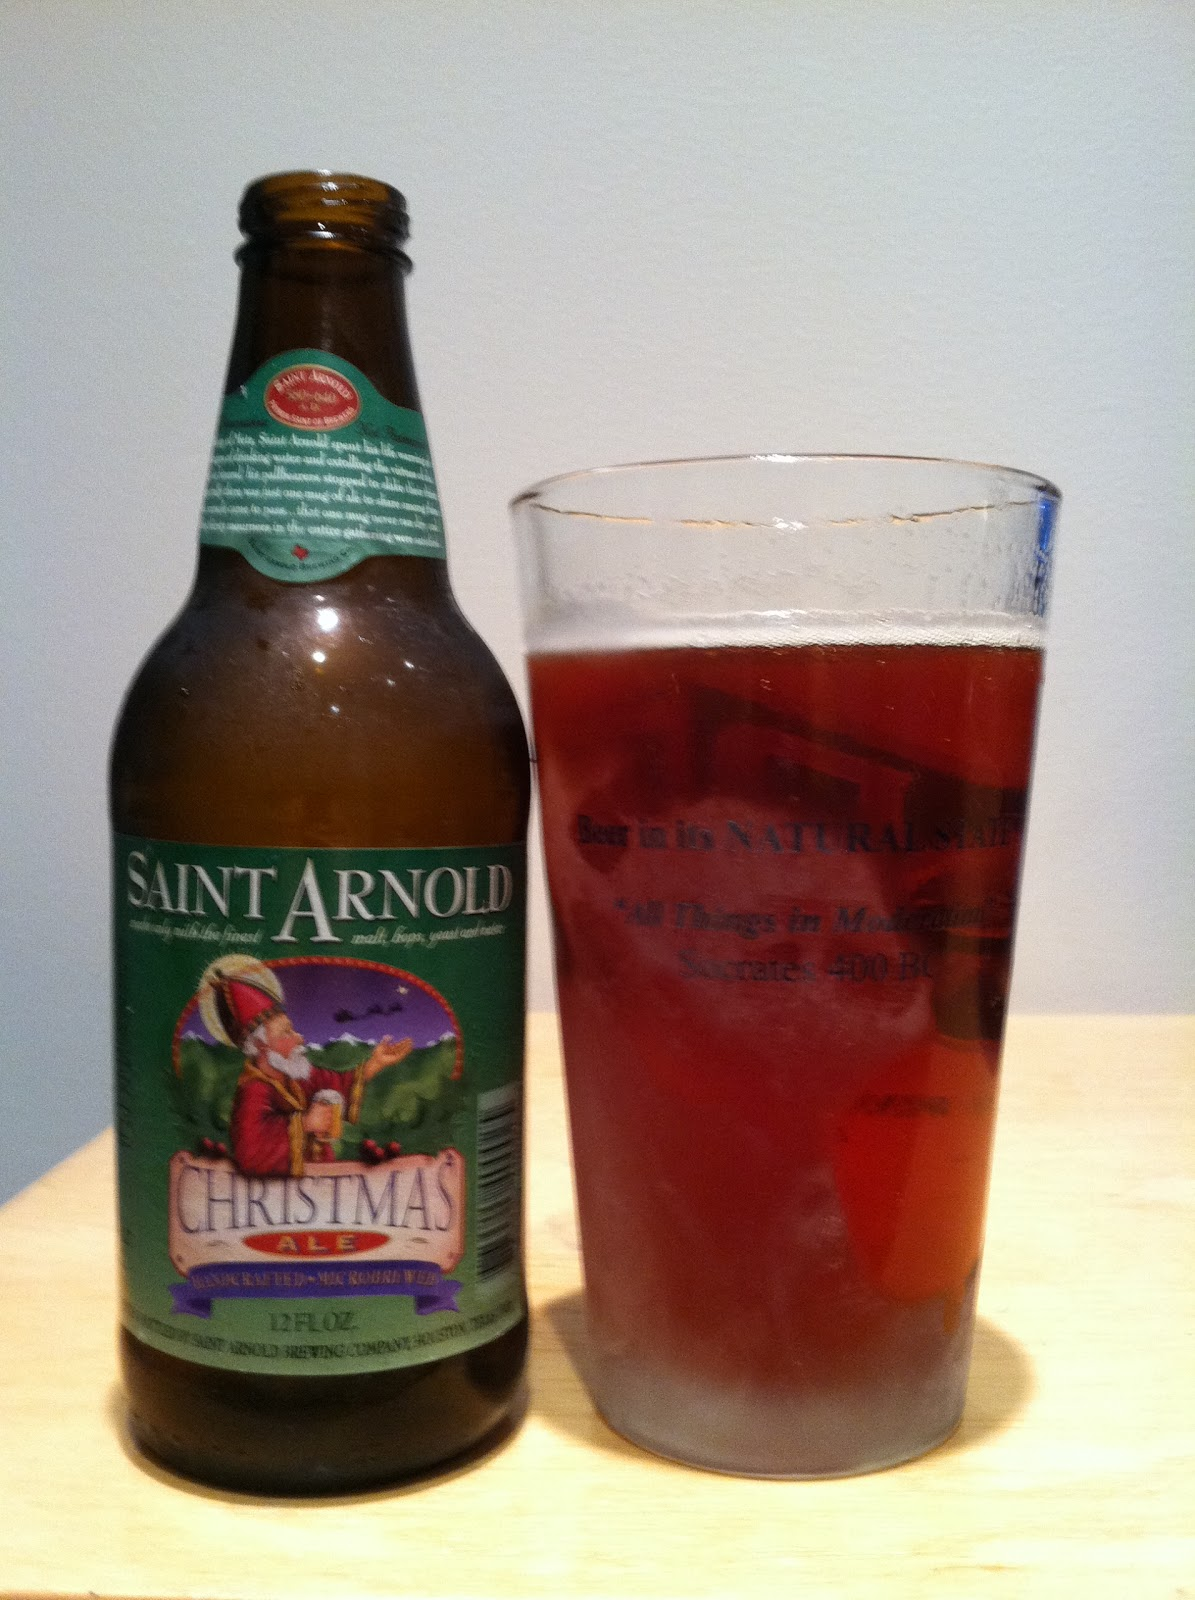 The Best Beer Blog: Saint Arnold Christmas Ale